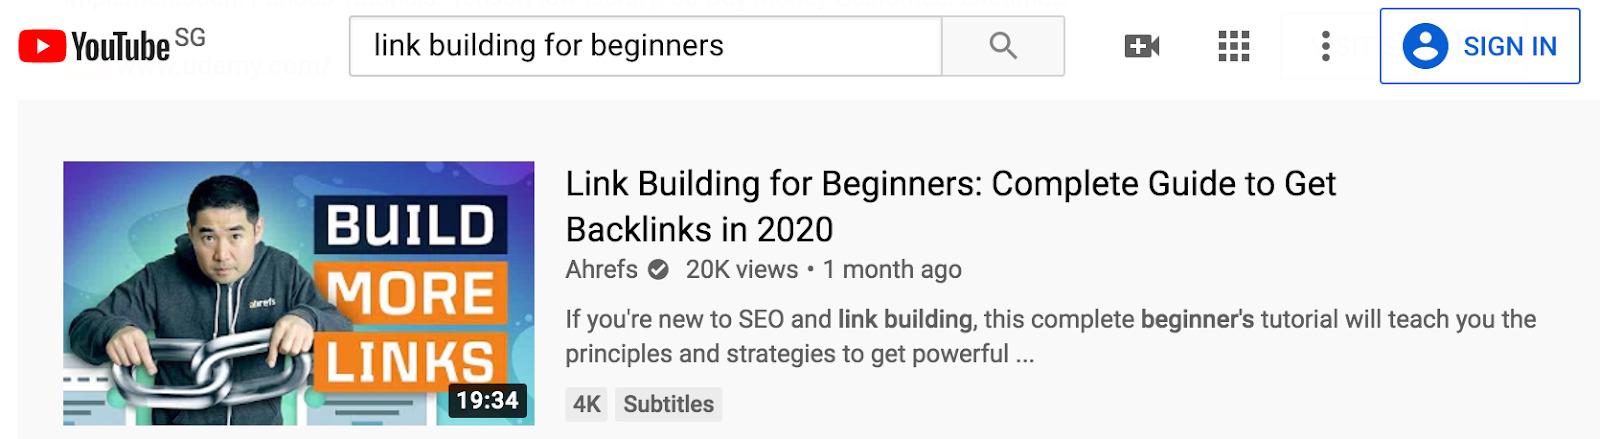 youtube link building ahrefs